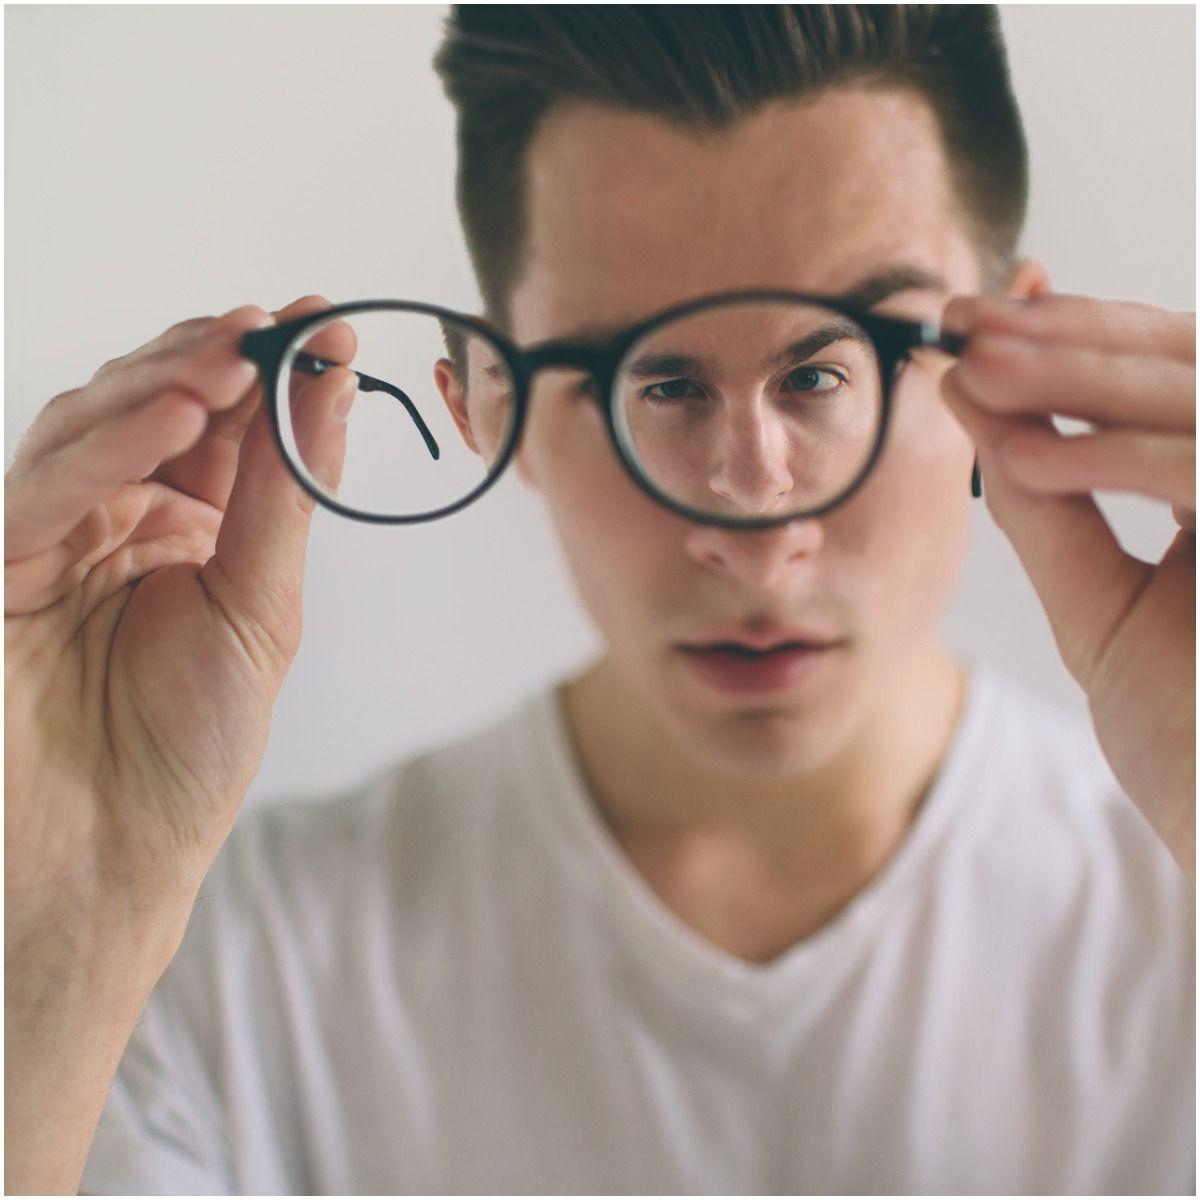 Spiritual Meaning ofMyopia (Nearsightedness)